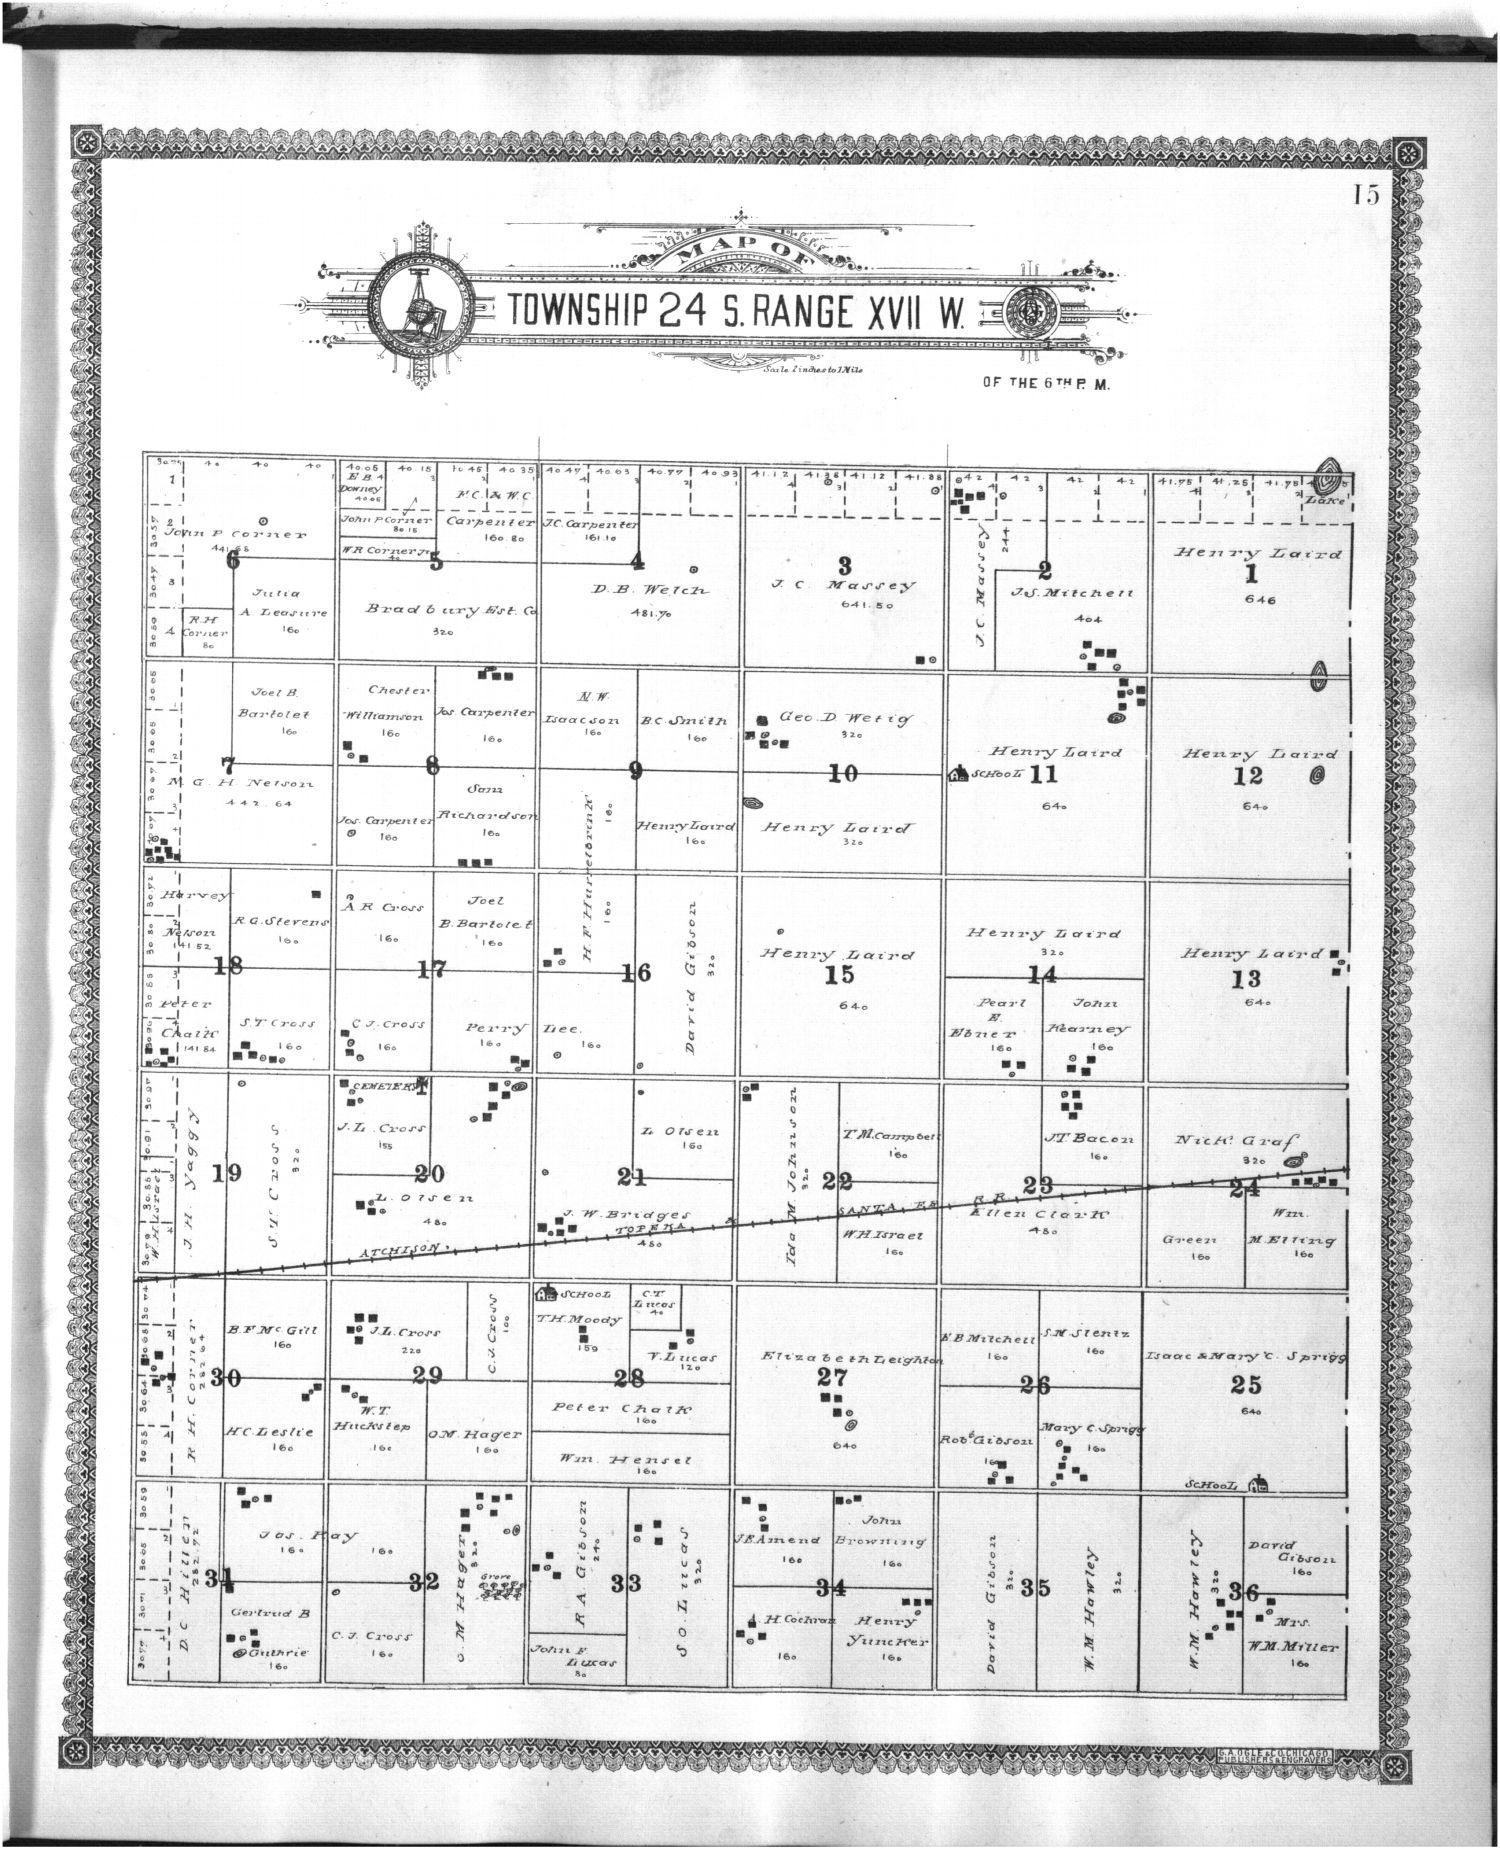 Standard atlas of Edwards County - 15